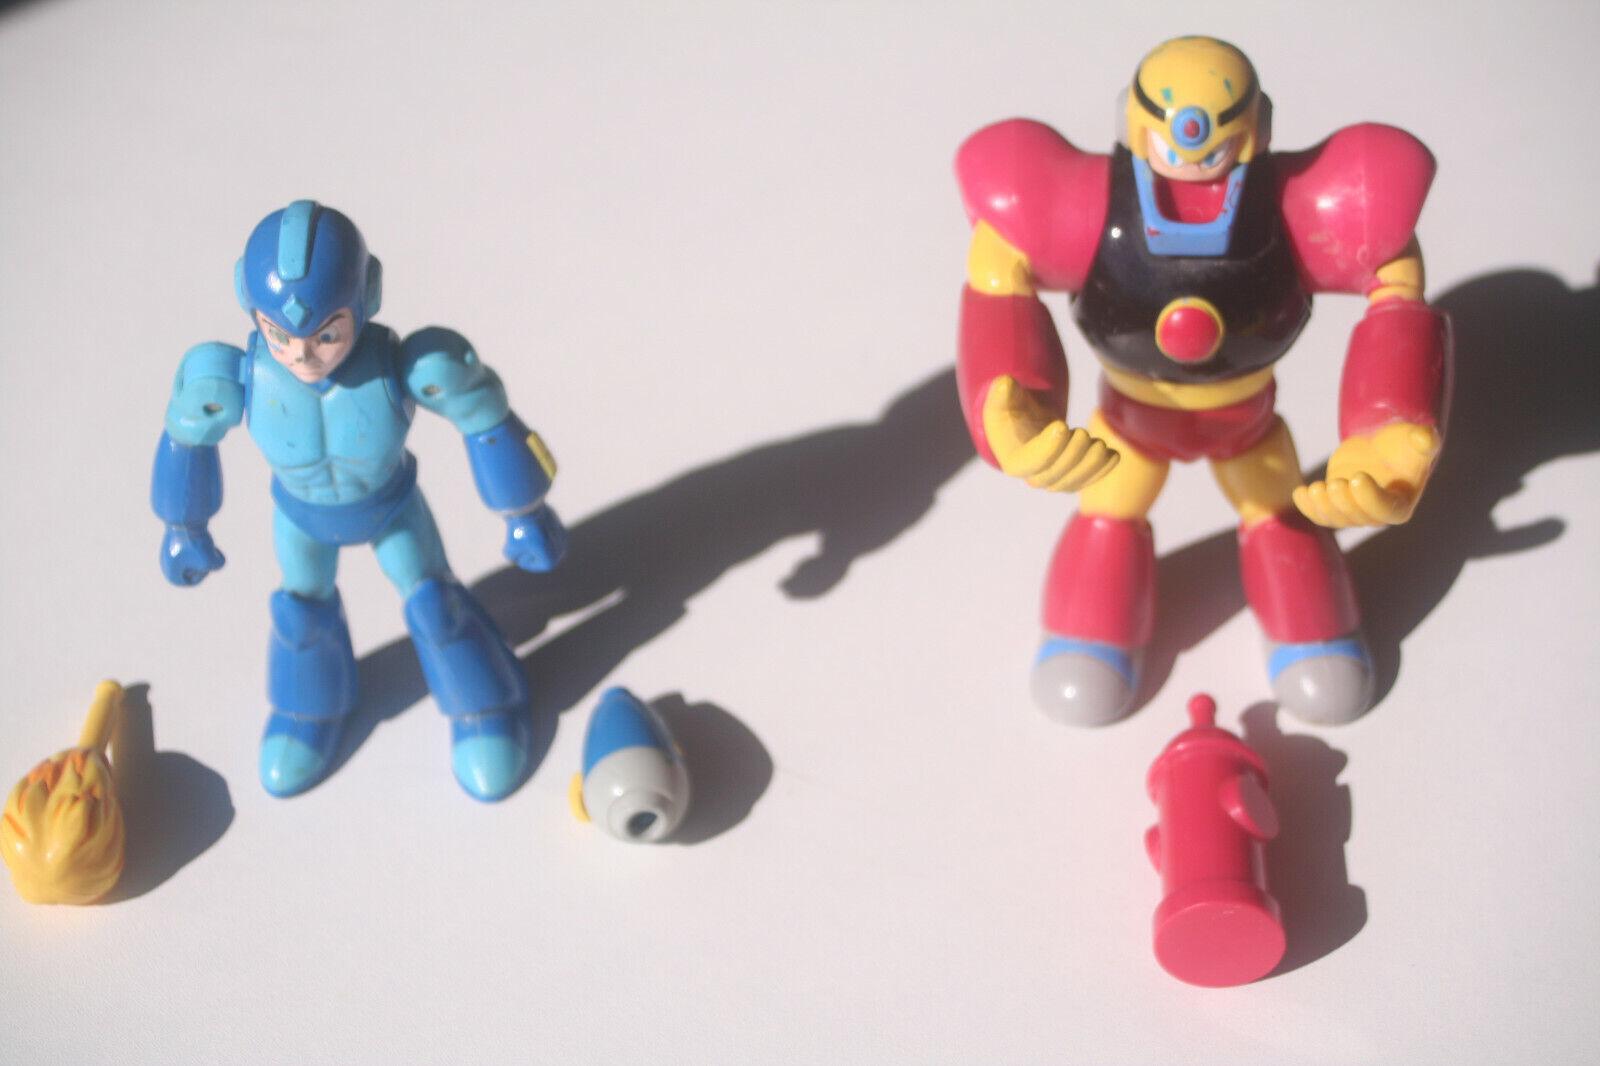 Mega Man Action Figures 1994 Lot Lot Lot Mega Man + Guts Man Vintage 6dc69c